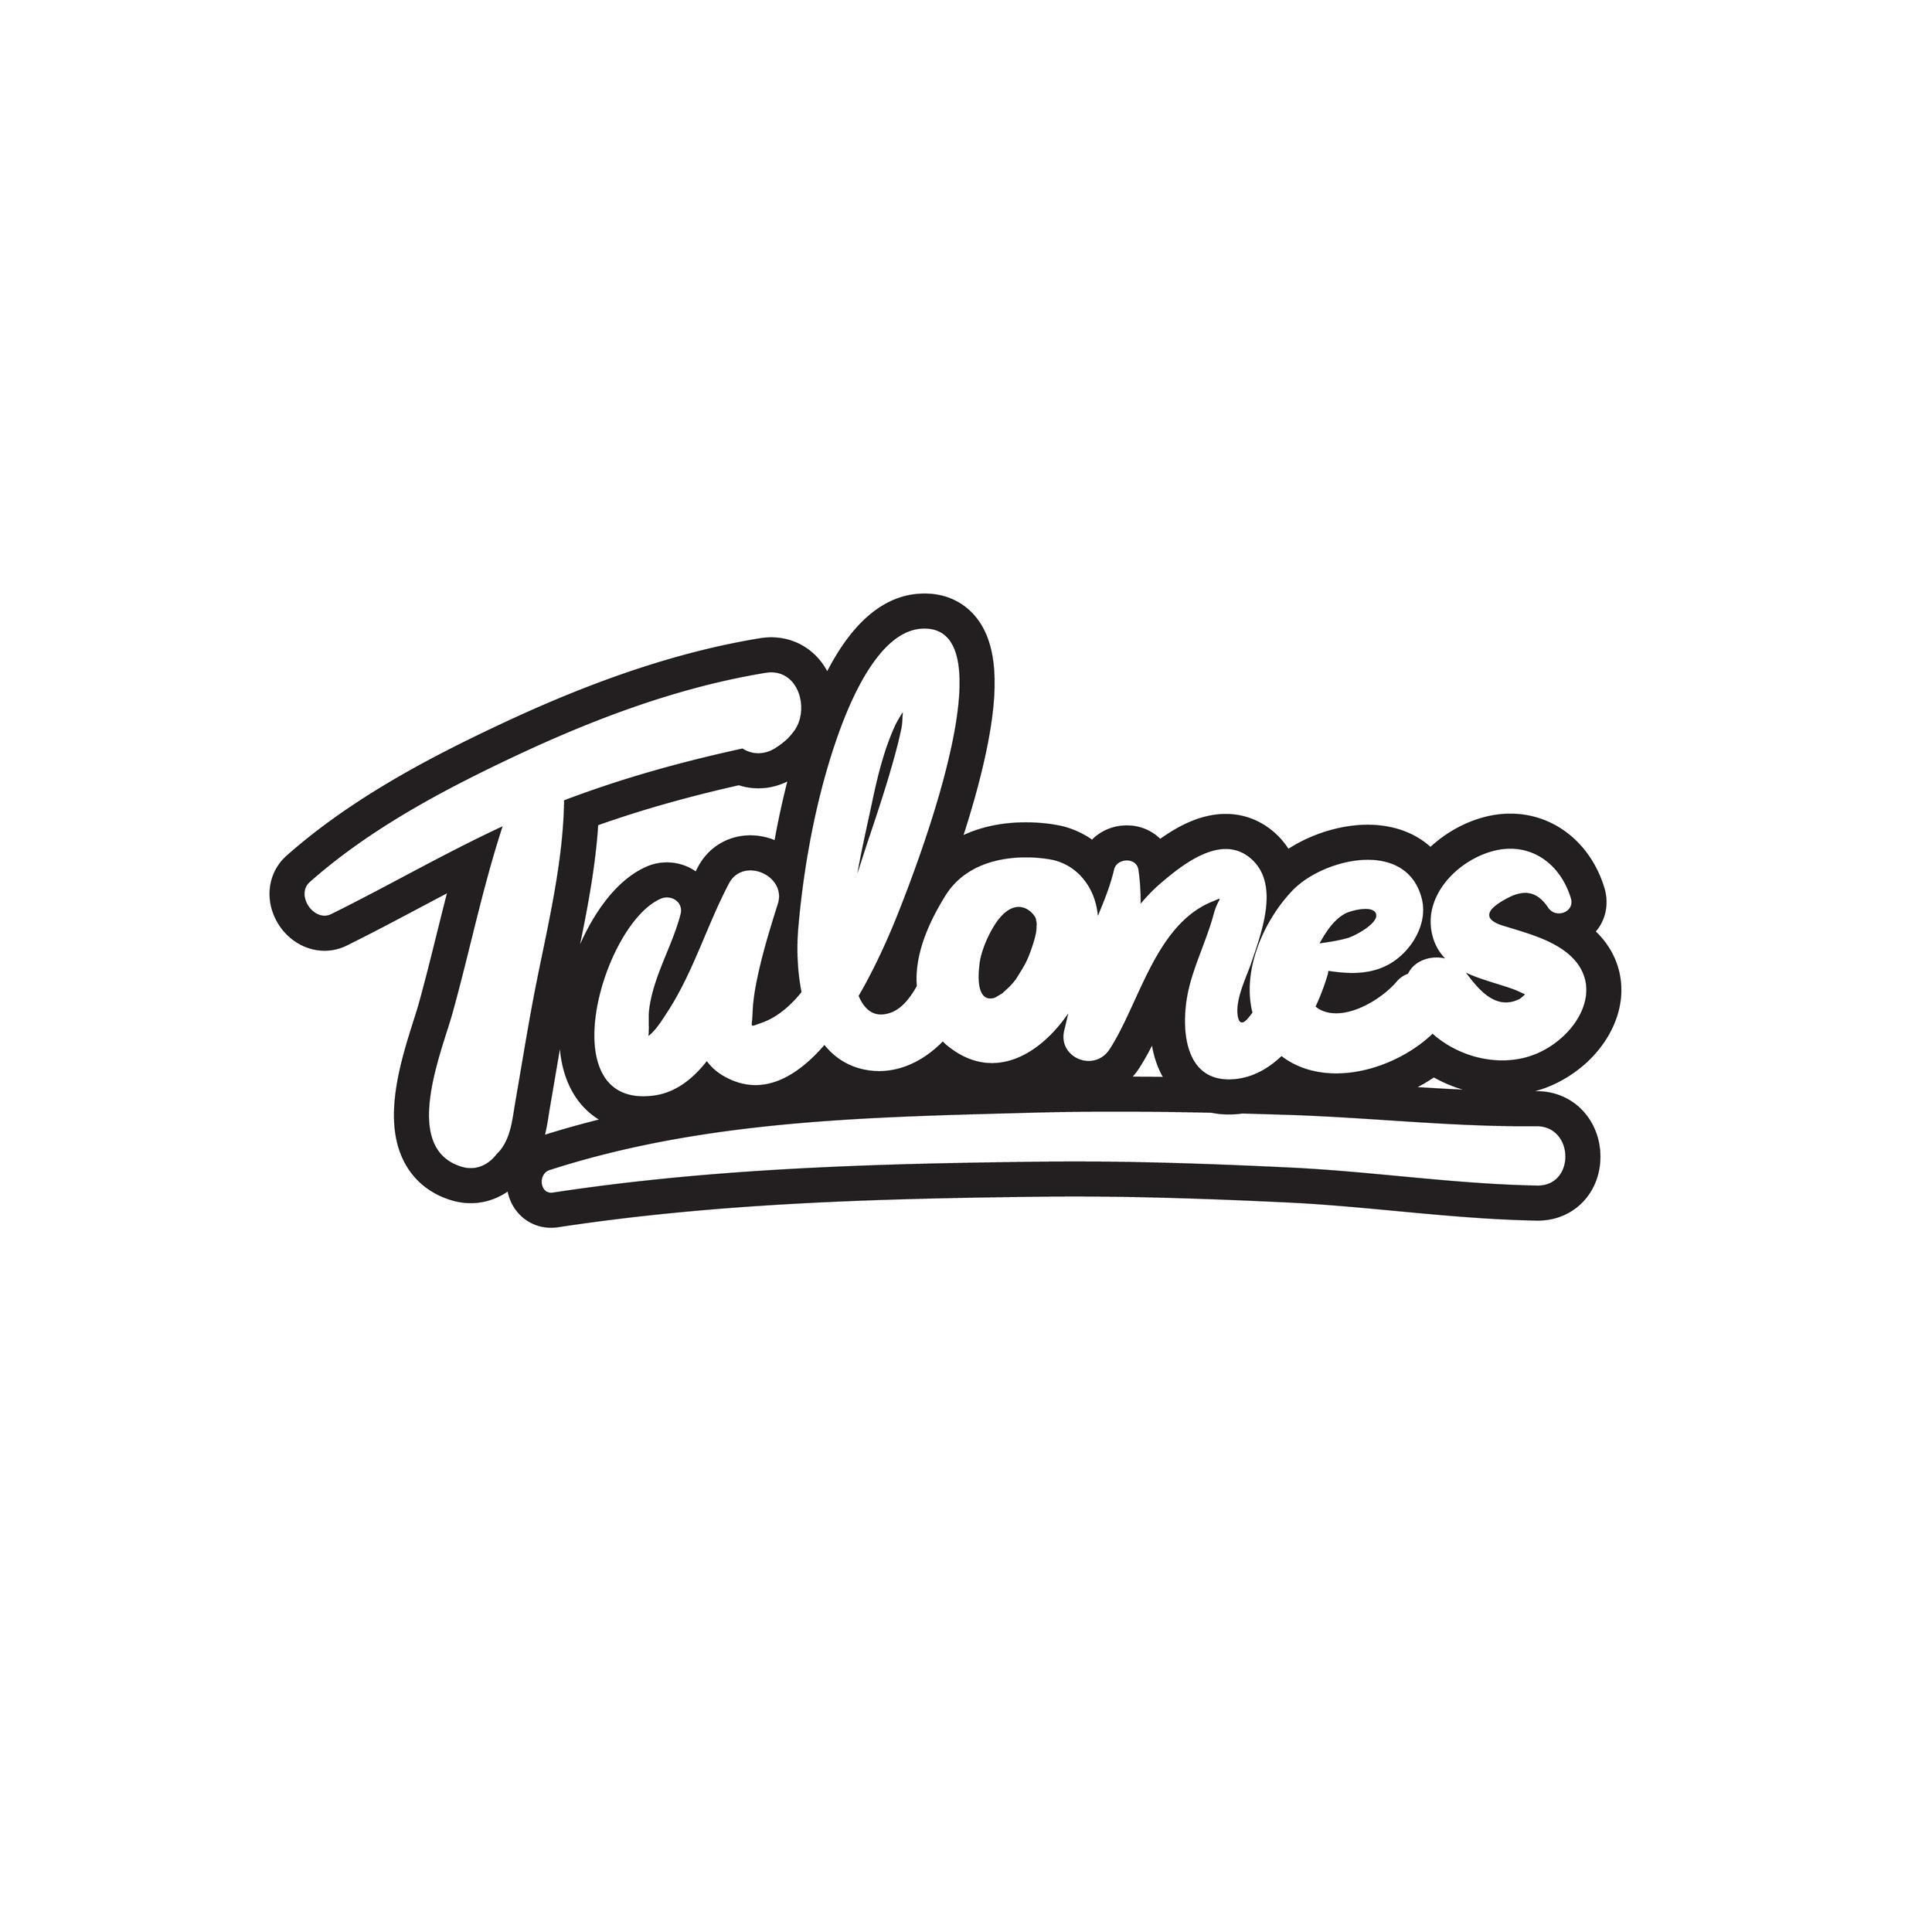 Tulones_Cursive_Logo-01.jpg